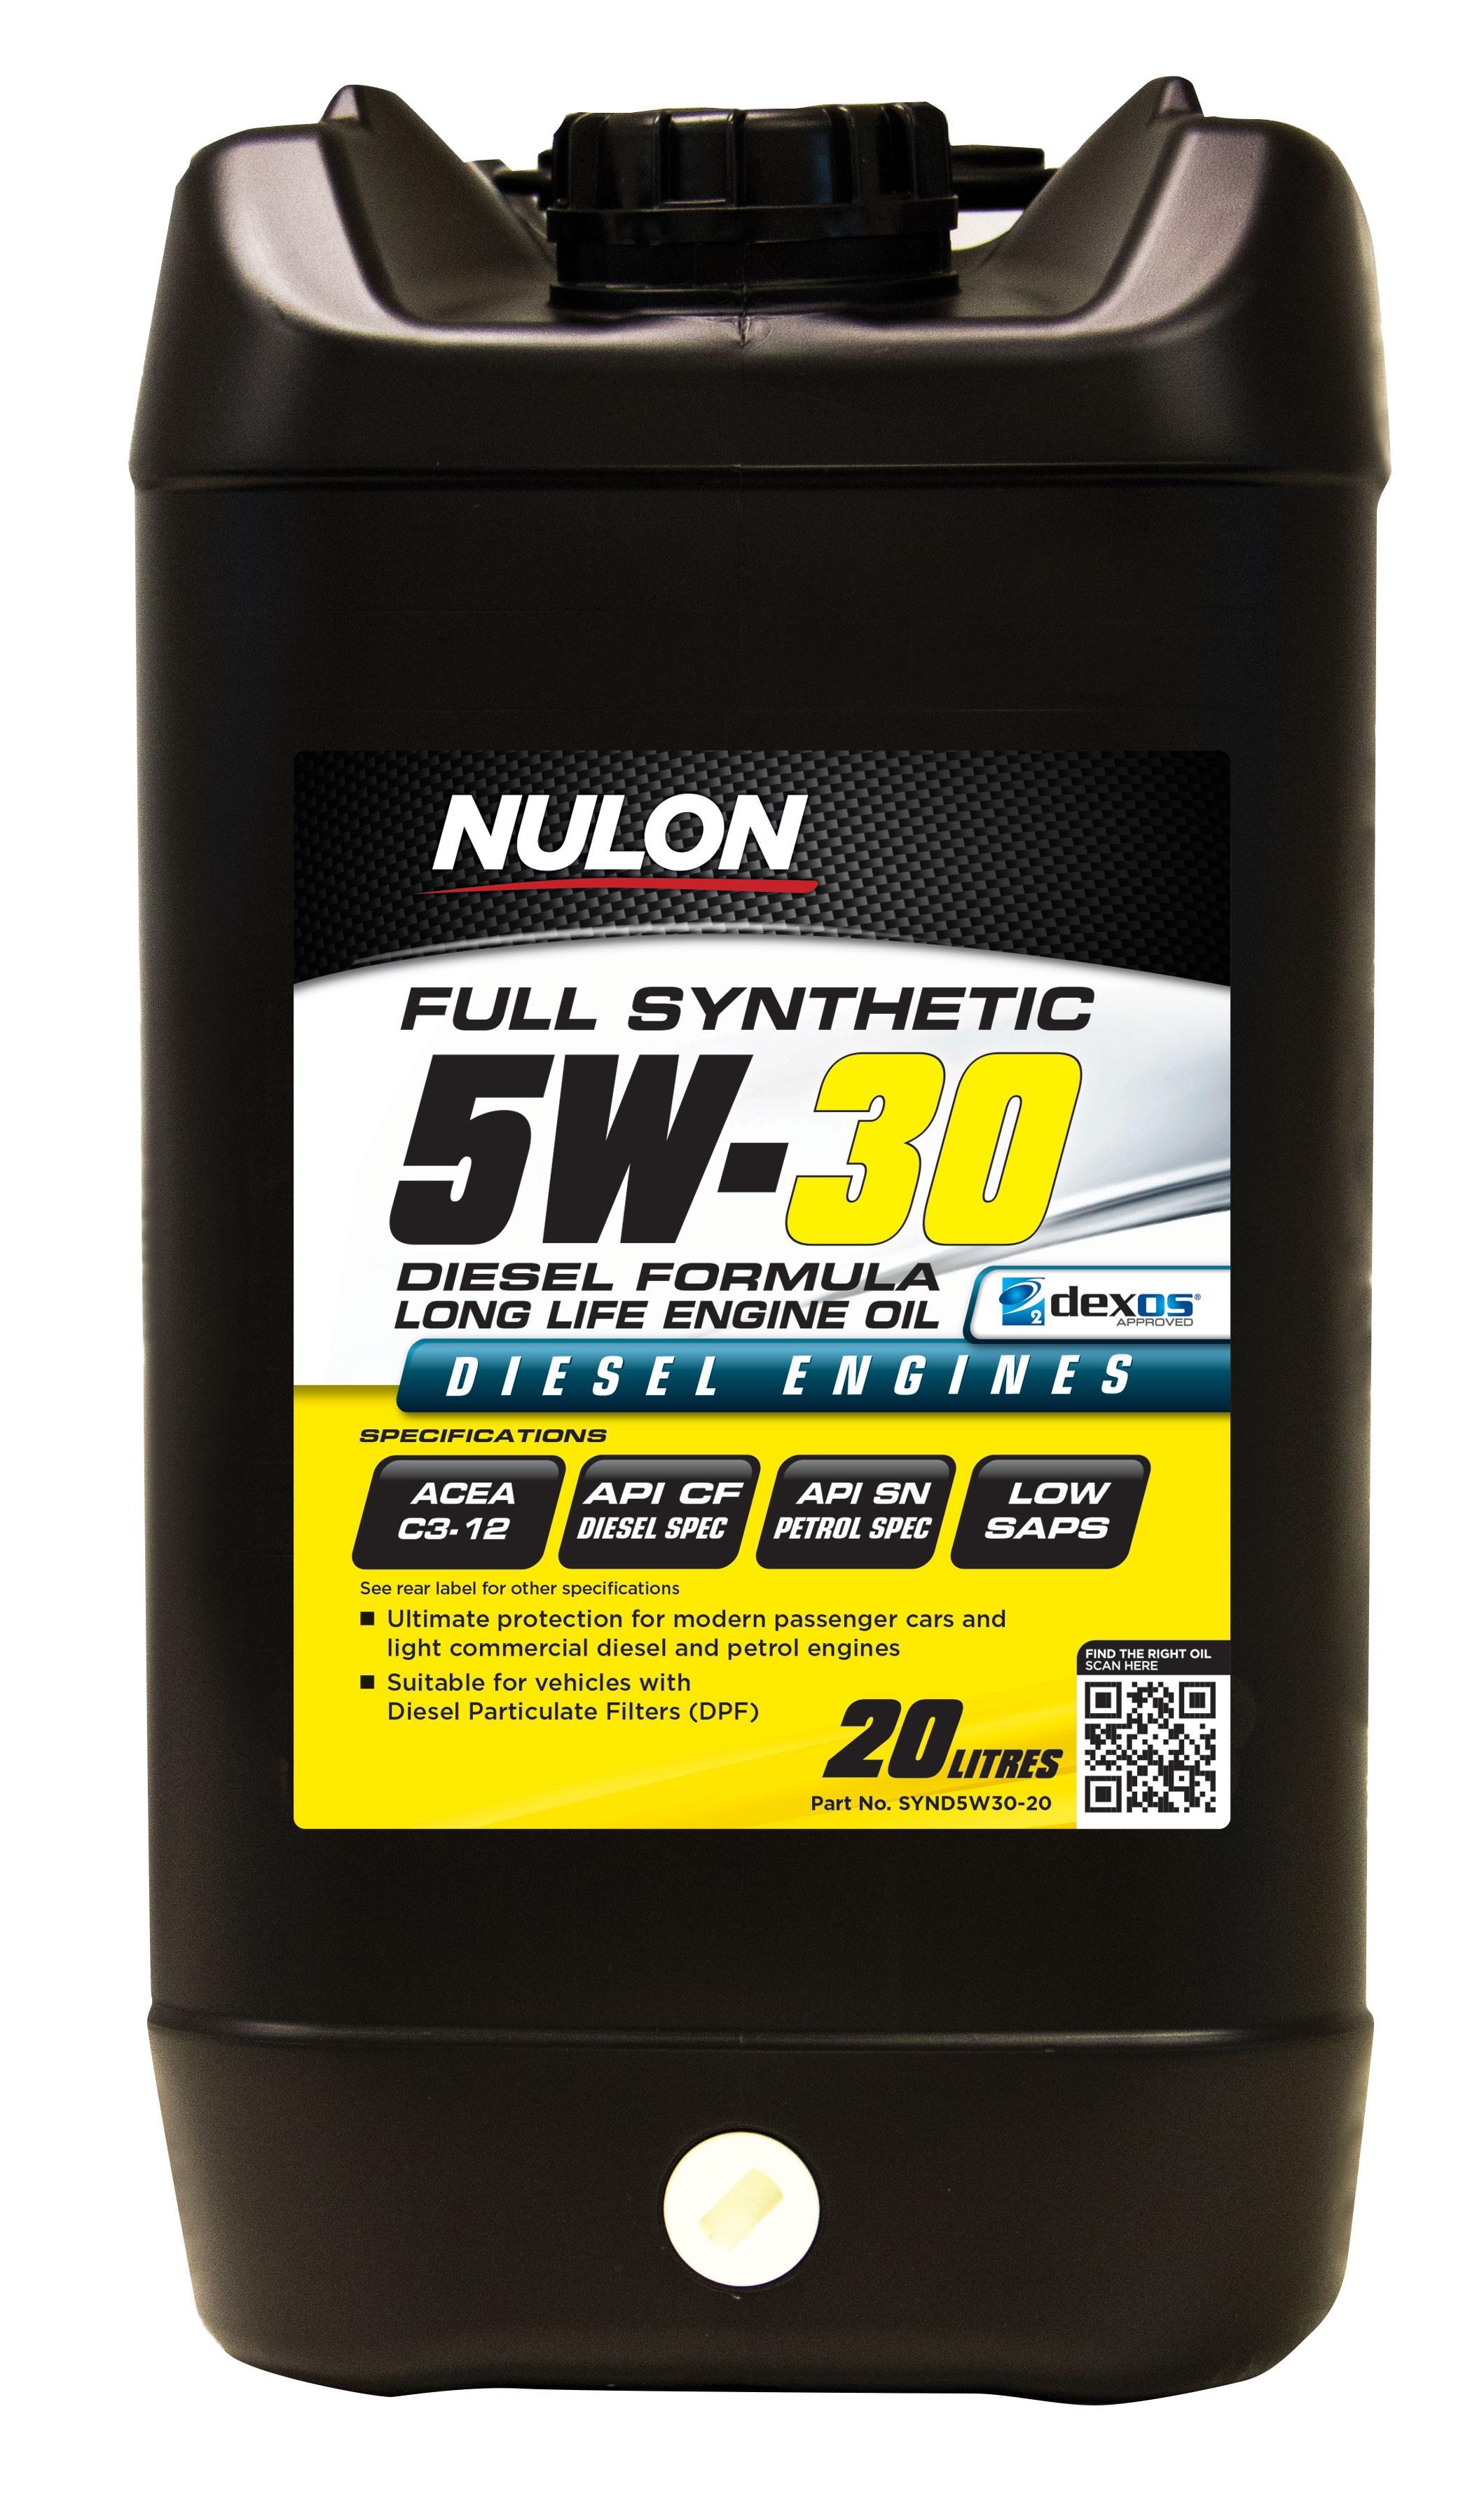 nulon full synthetic 5w30 diesel formula long life engine. Black Bedroom Furniture Sets. Home Design Ideas